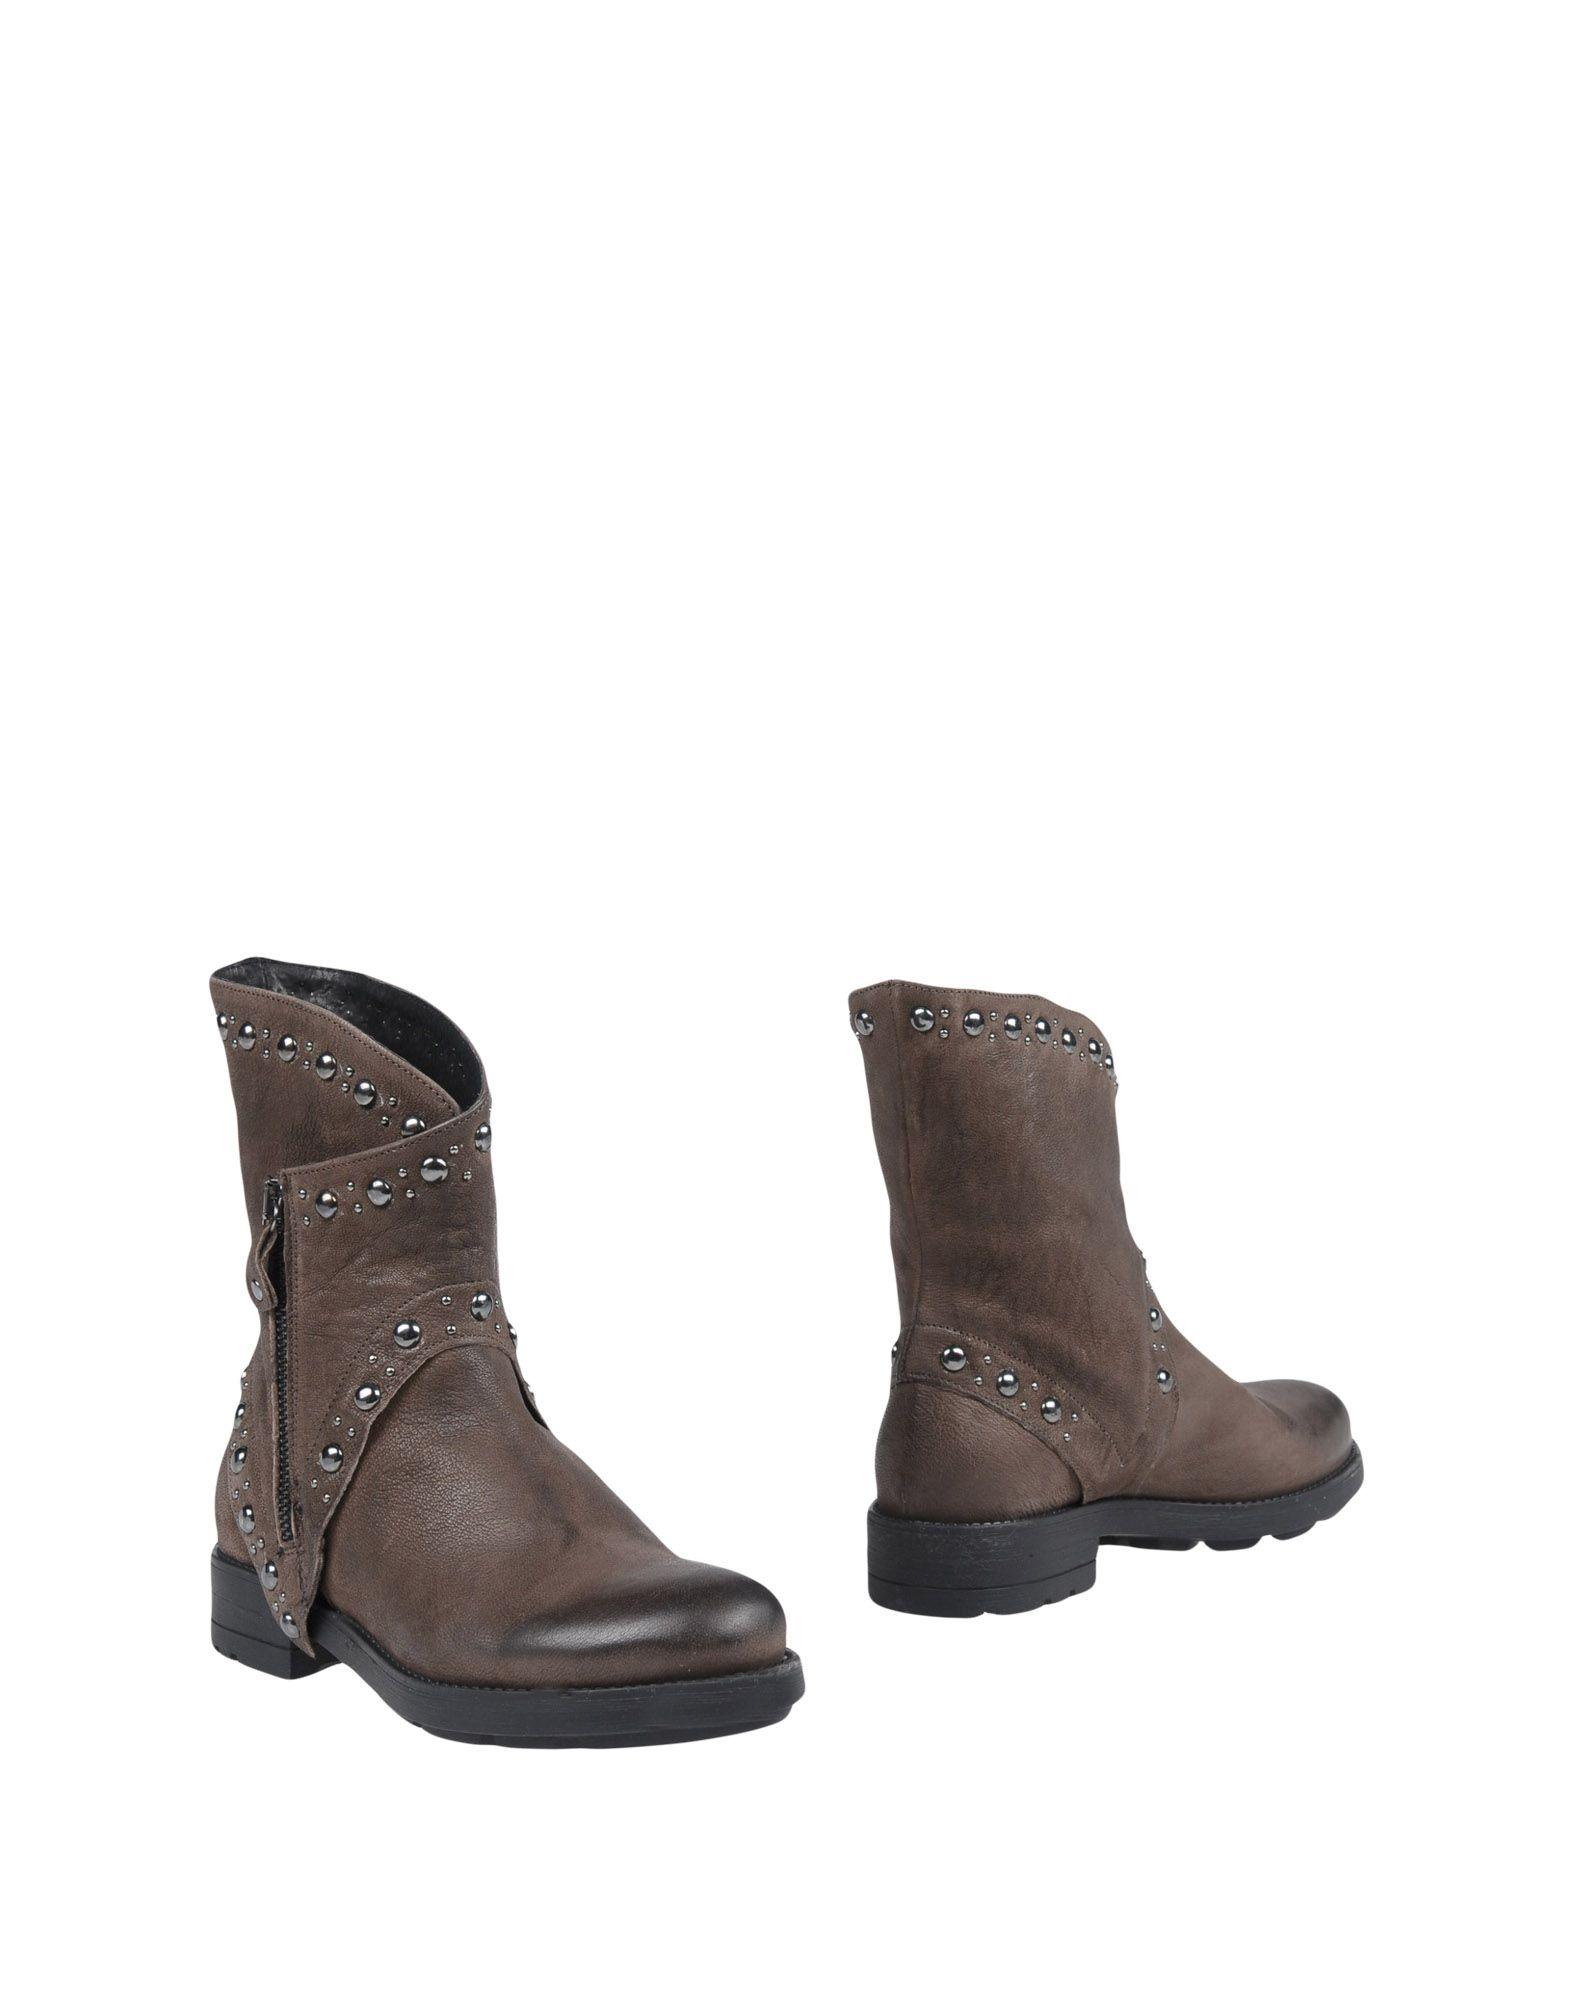 Manufacture D'essai Stiefelette Damen  11423210VC Gute Qualität beliebte Schuhe